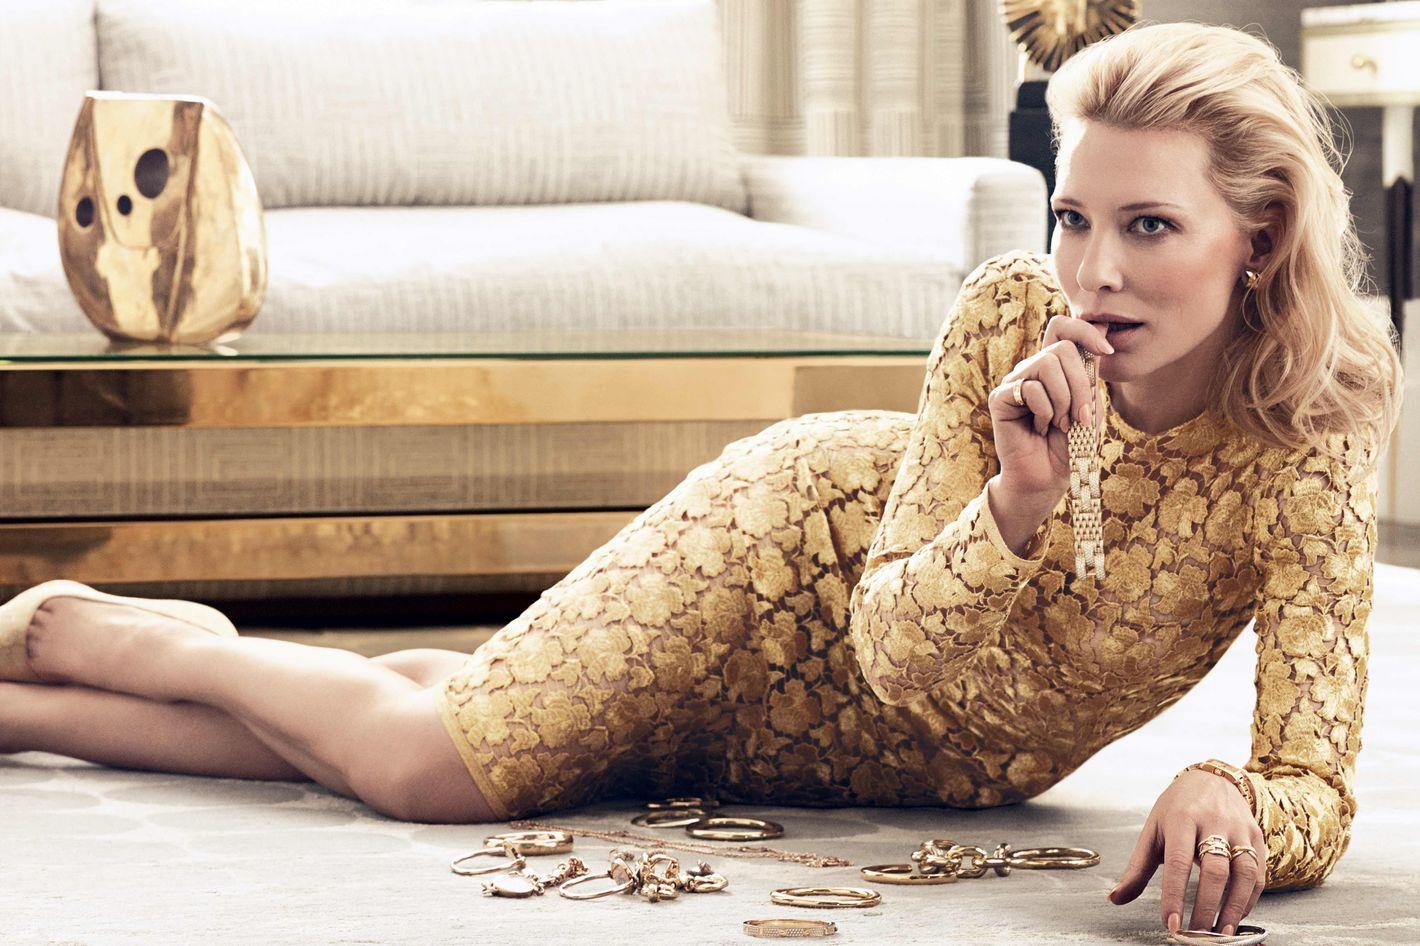 Erotica Cate Blanchett nude (47 photos), Pussy, Sideboobs, Selfie, underwear 2017